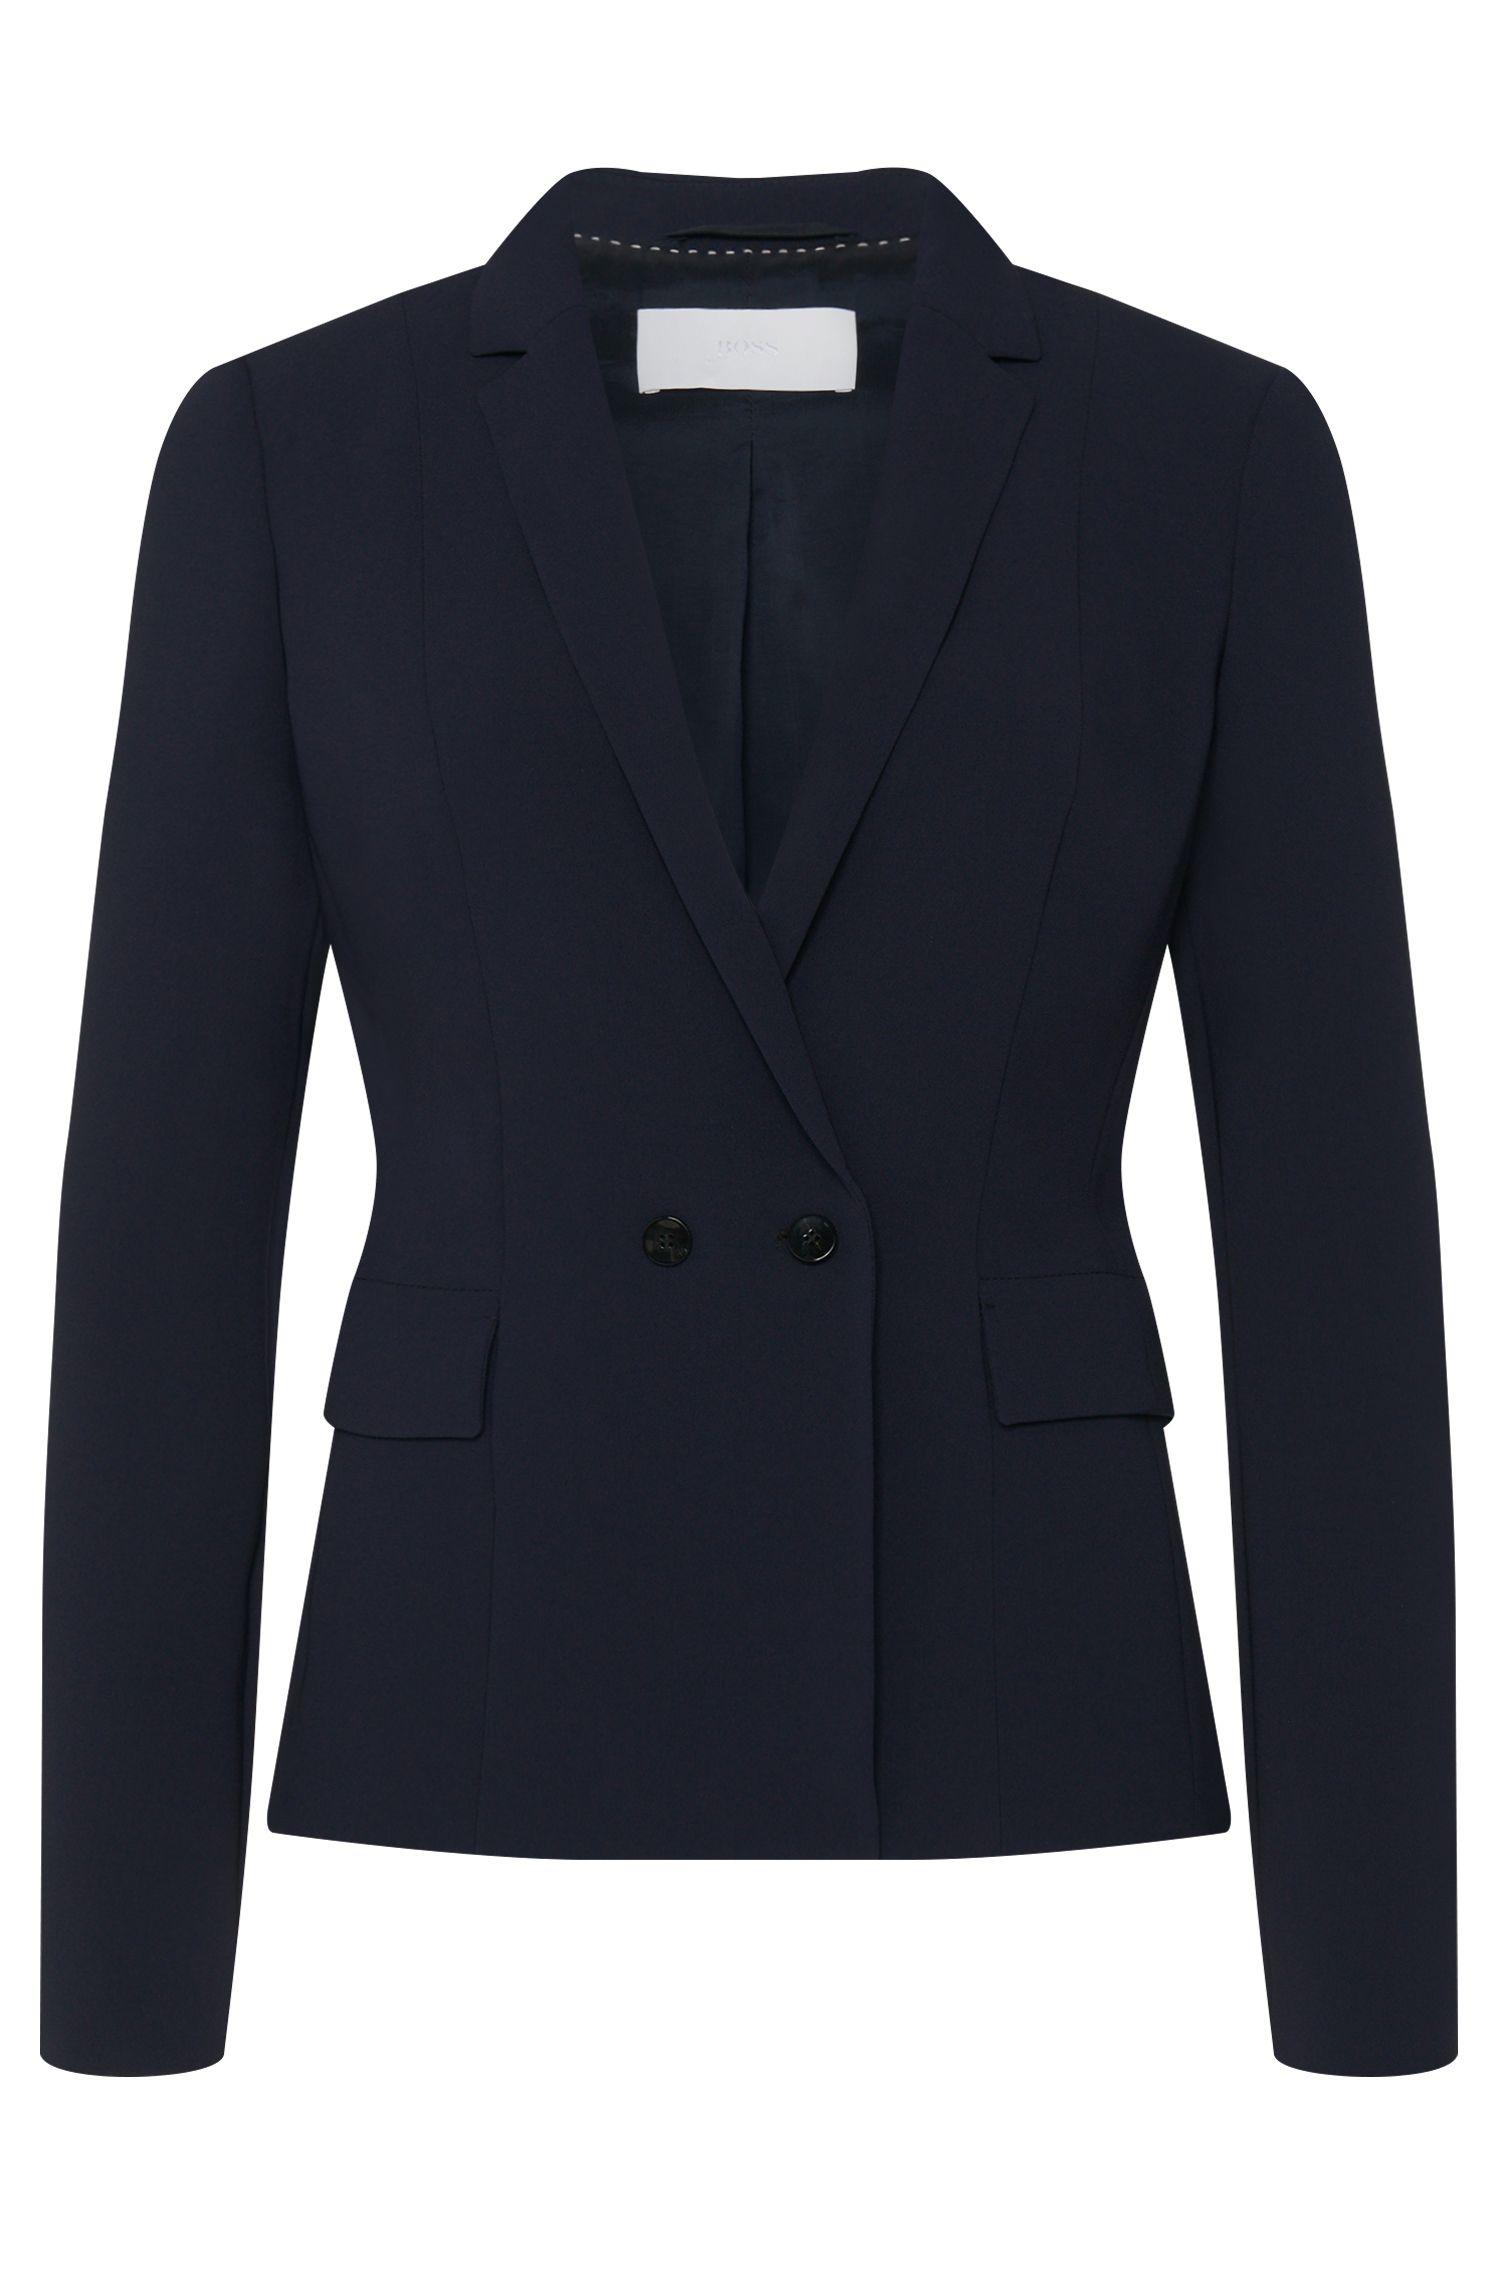 'Jutana'   Crepe Double Button Jacket